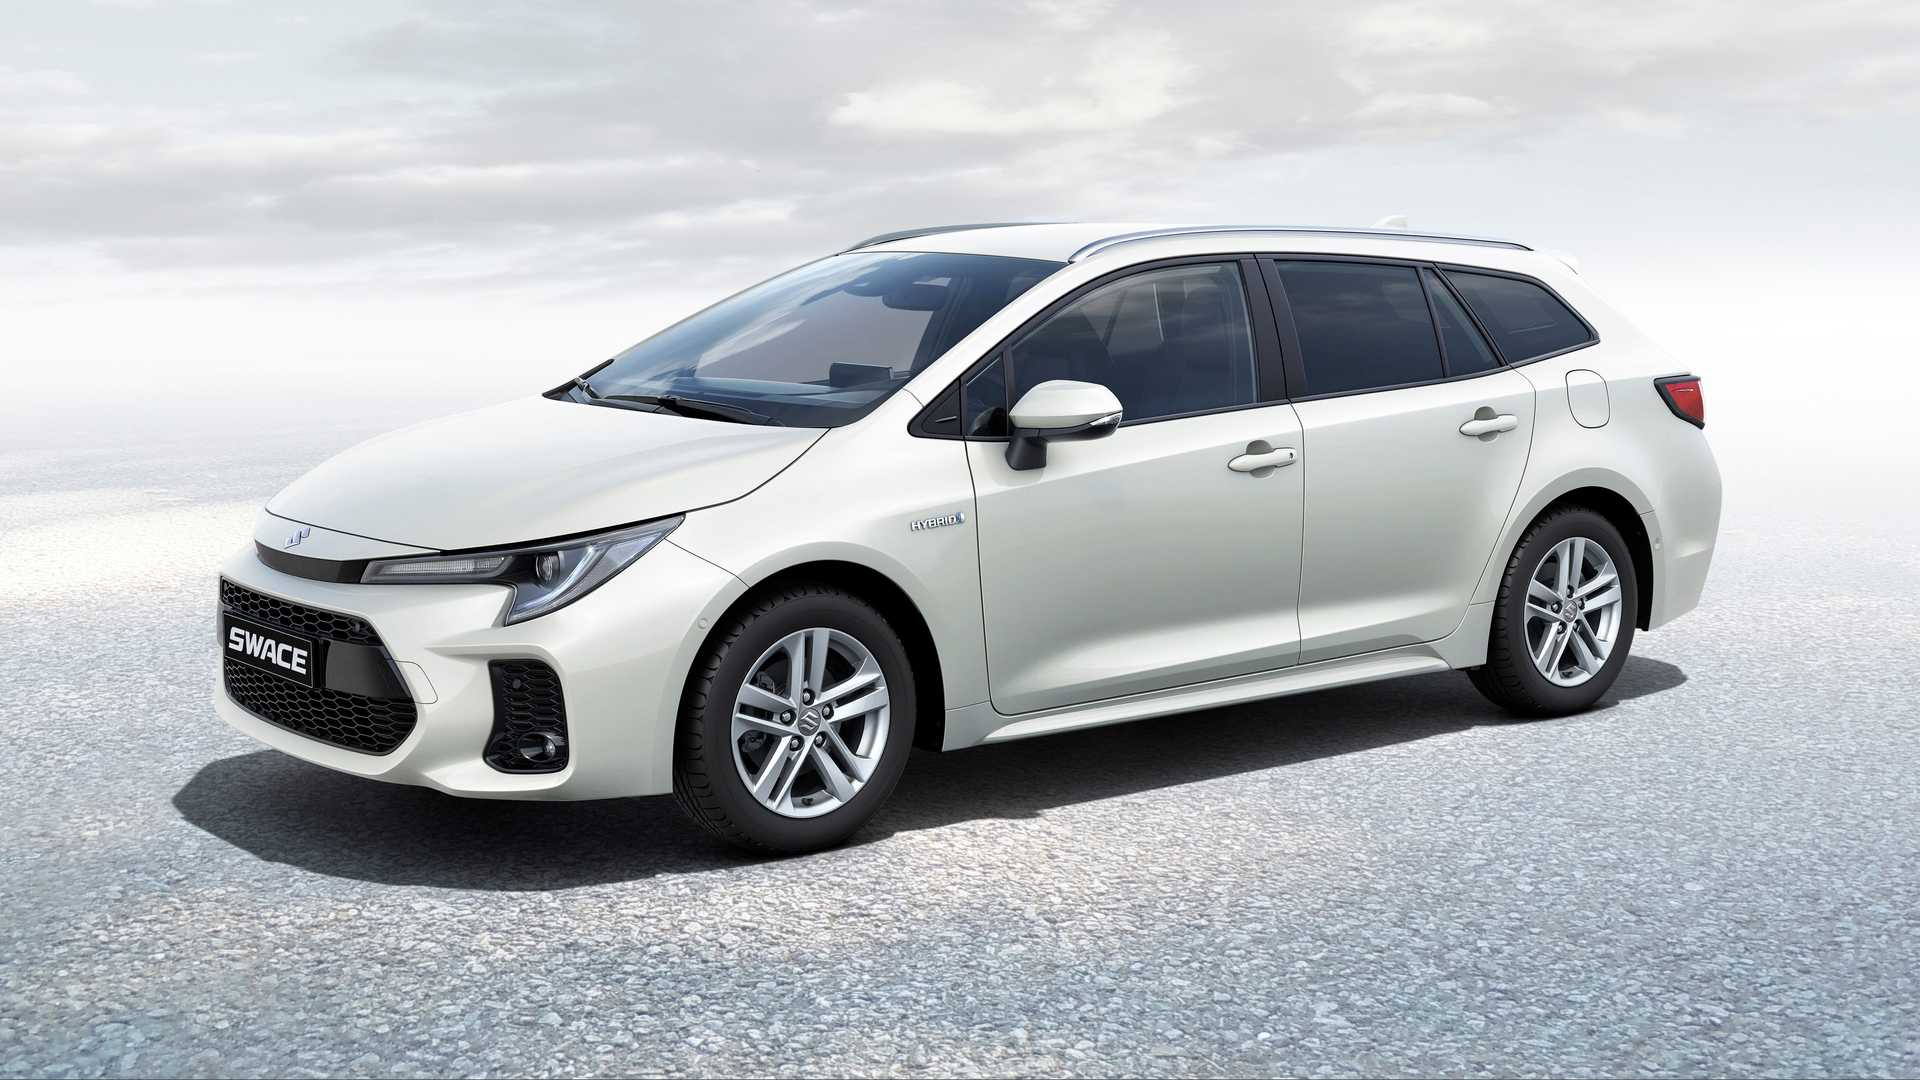 Kelebihan Kekurangan Toyota Suzuki Murah Berkualitas